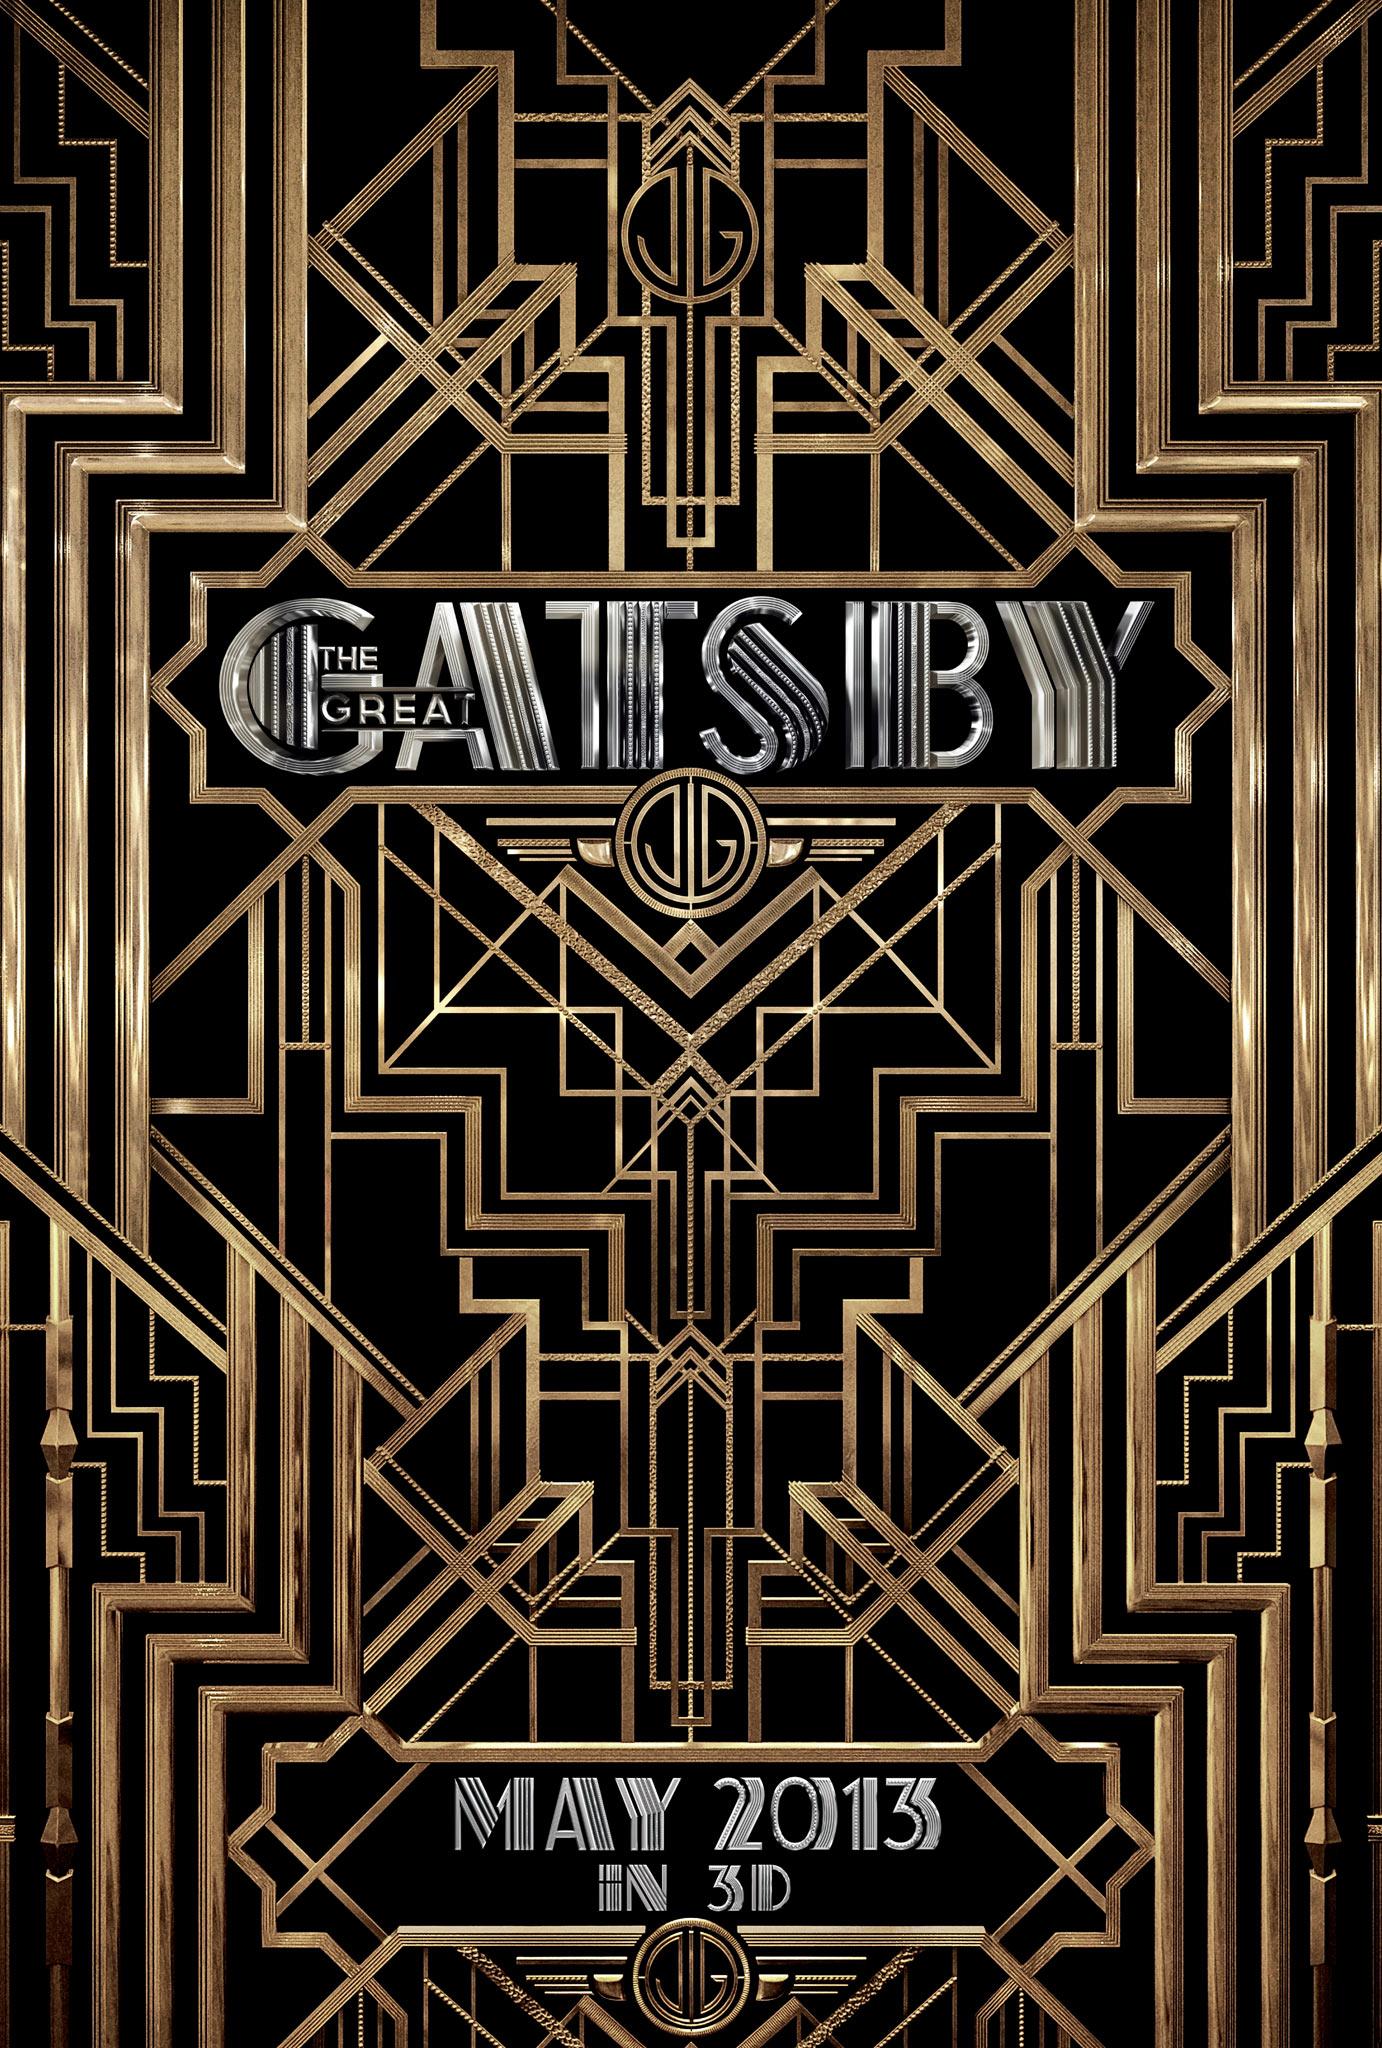 Gatsby font?? - forum | dafont.com